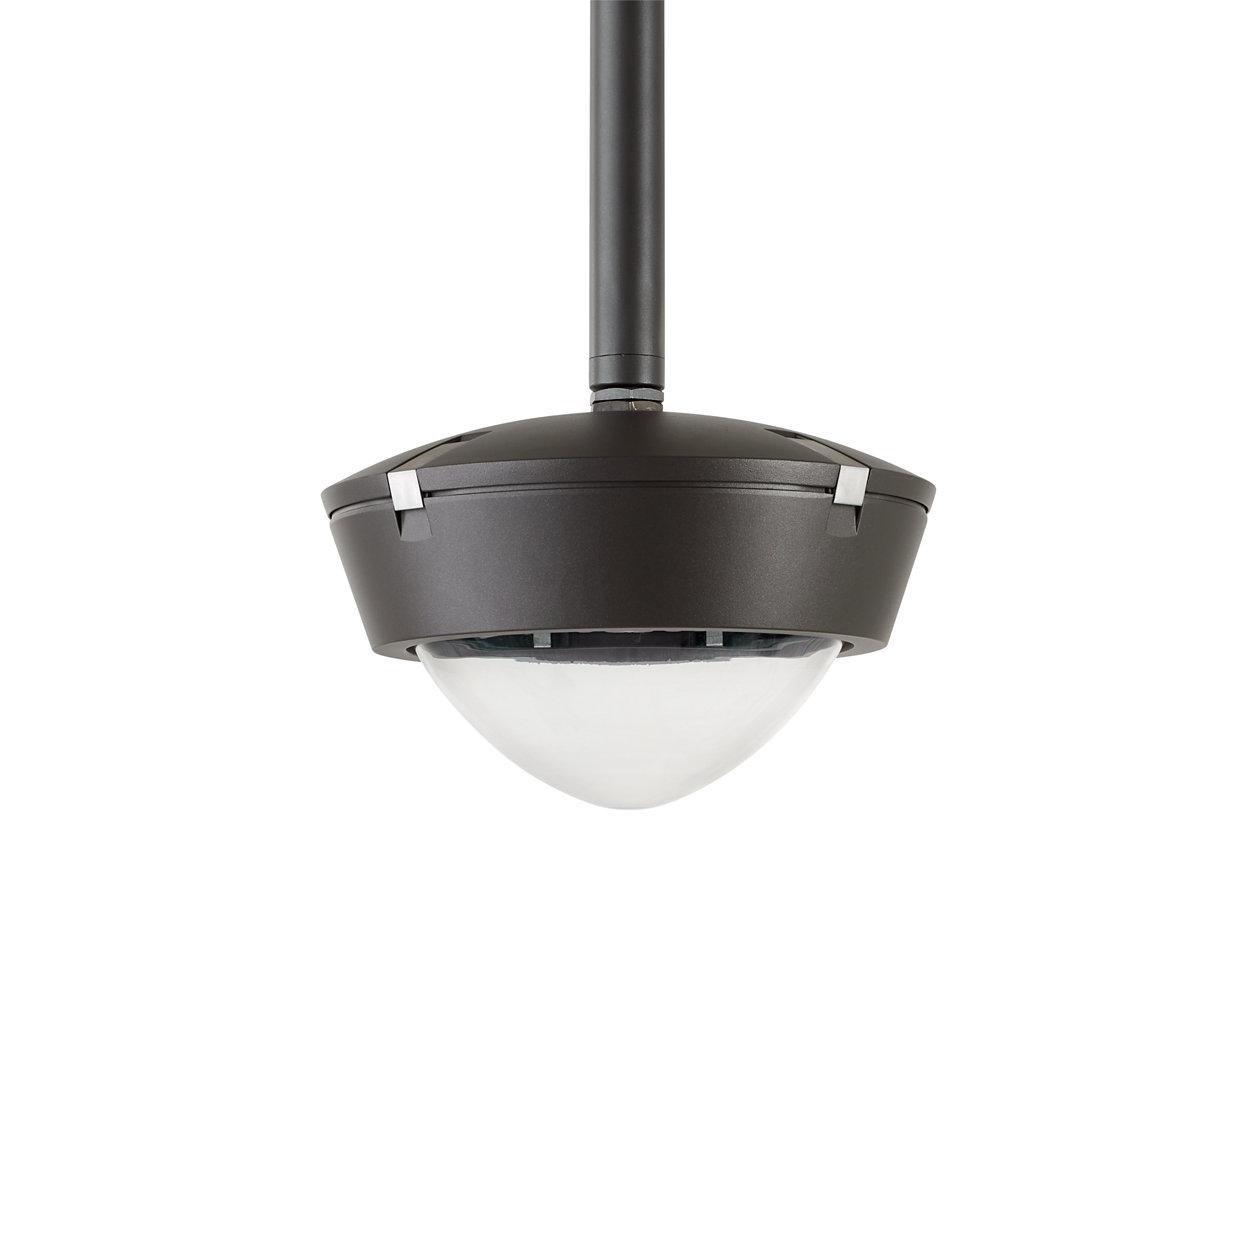 Thema 2 LED: efficient and elegant round luminaire